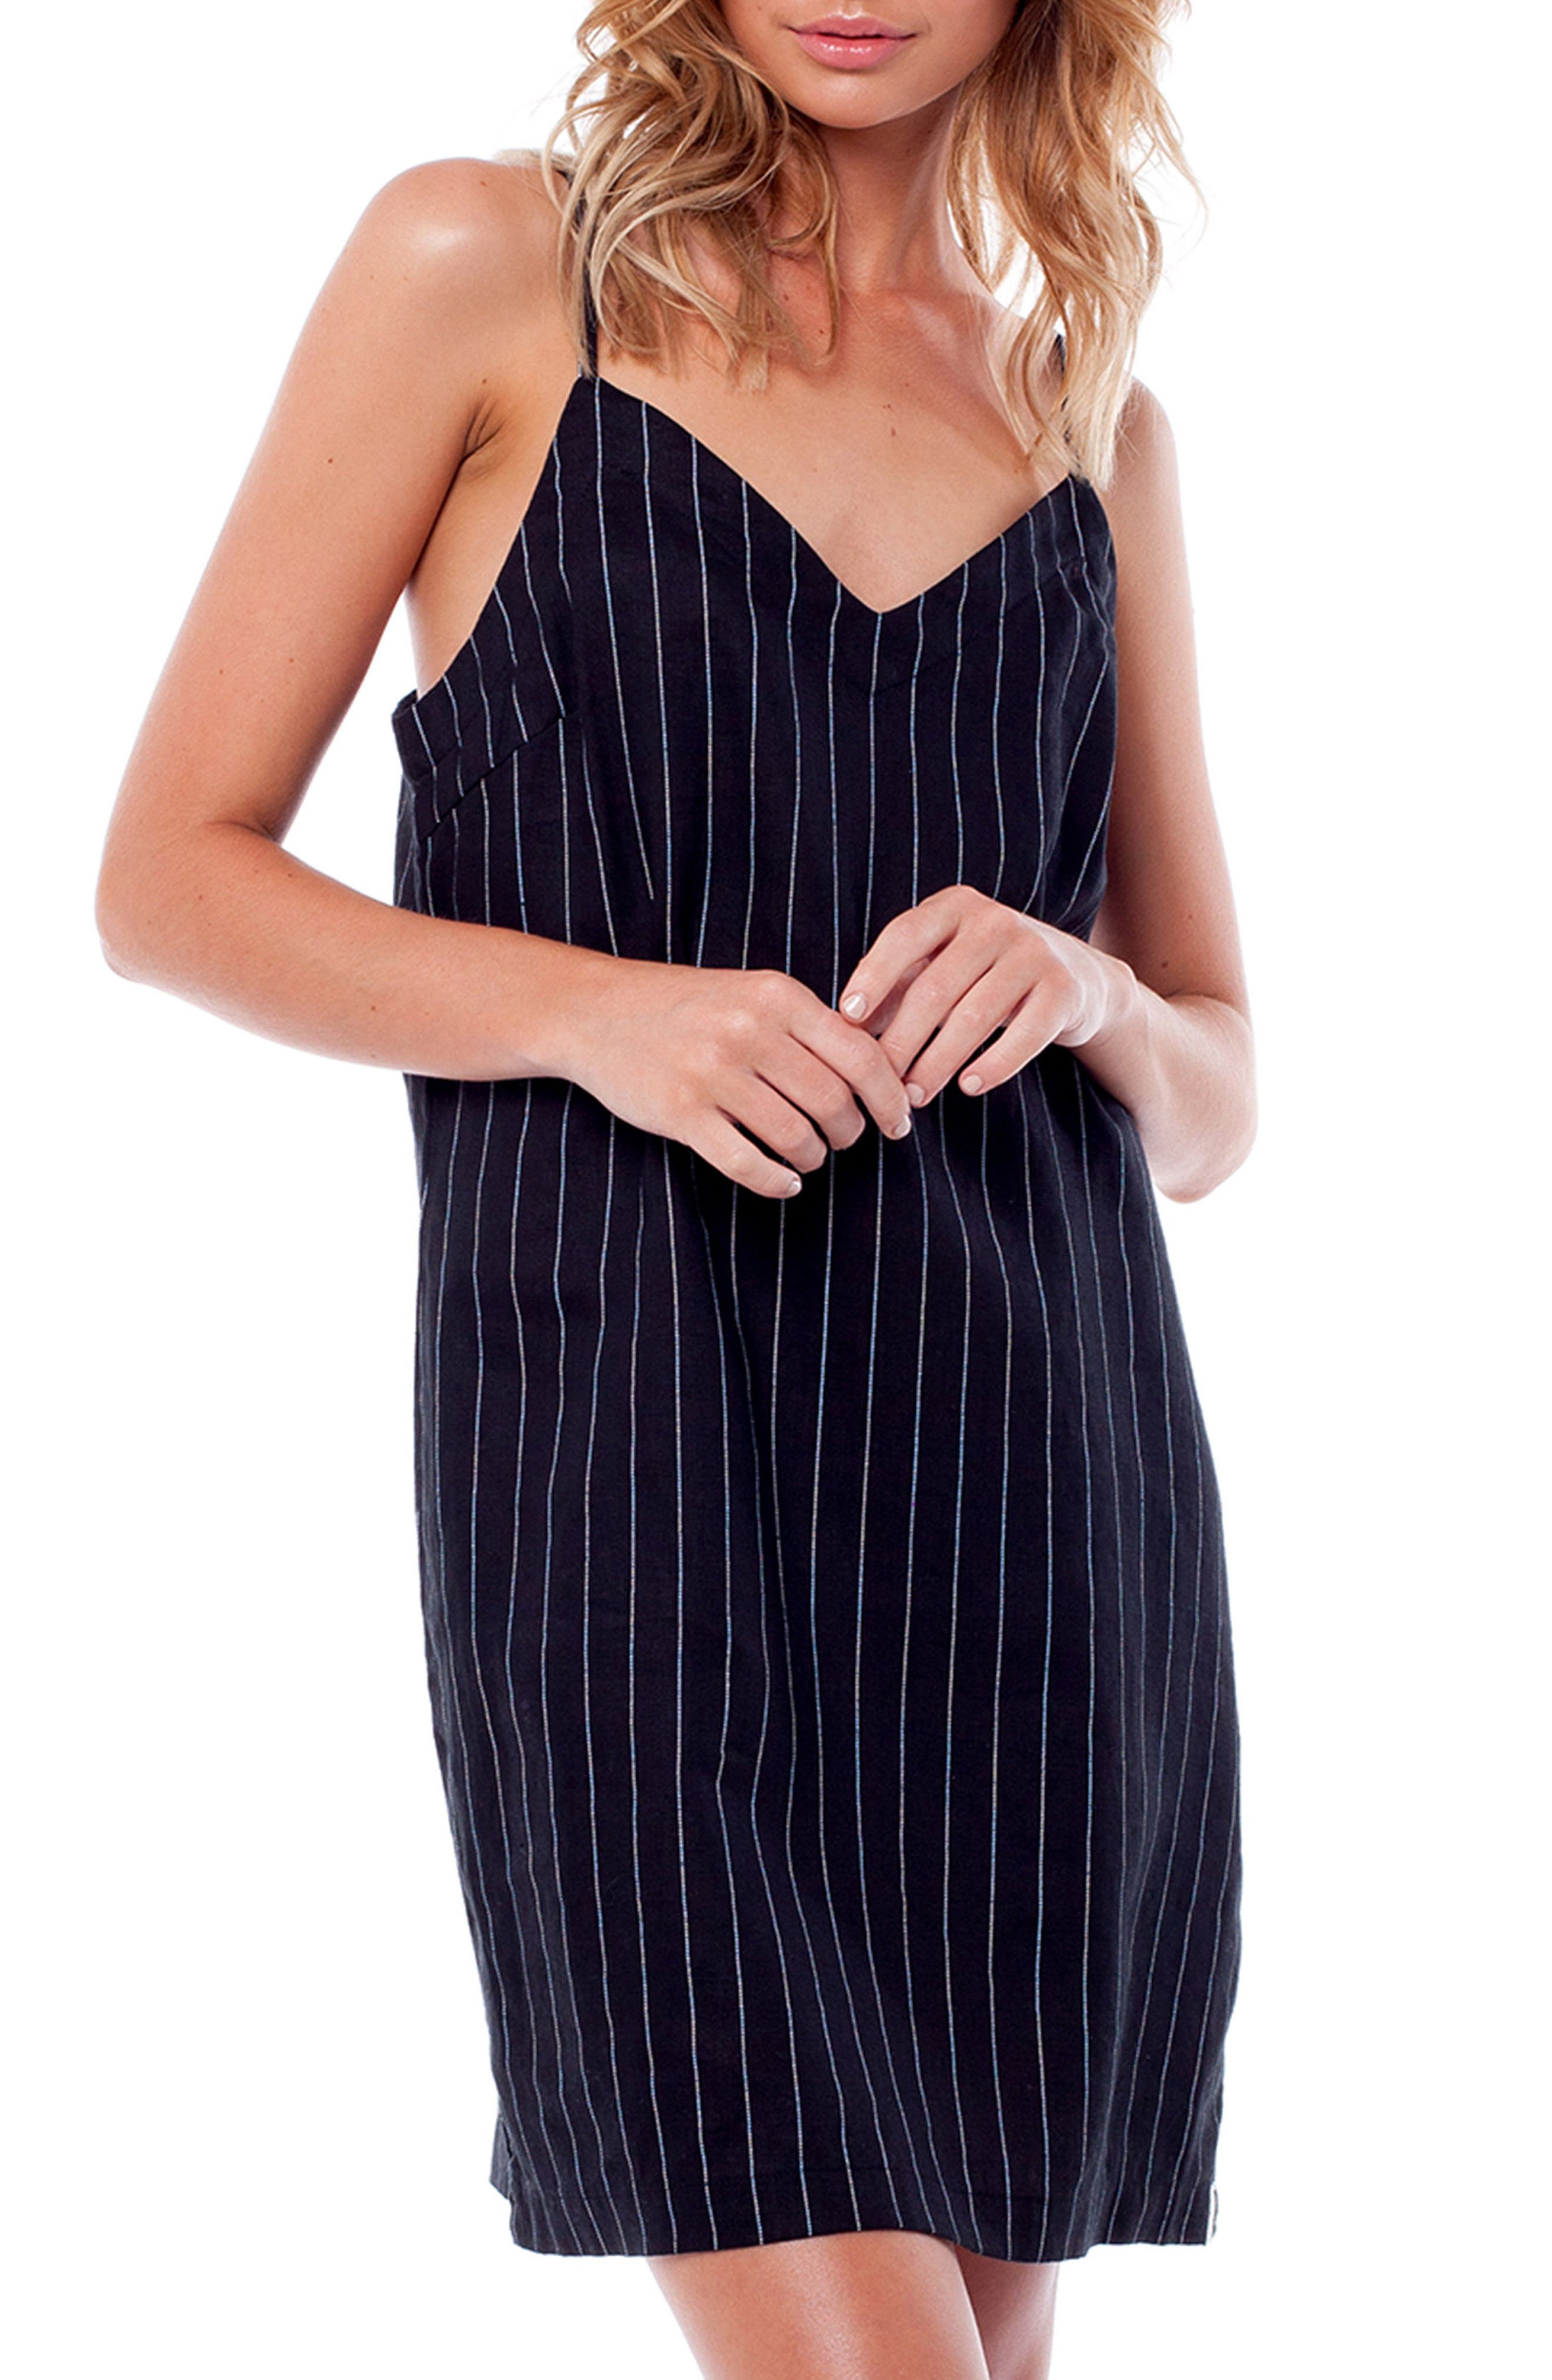 Catalina Cover-Up Dress,                         Main,                         color, BLACK